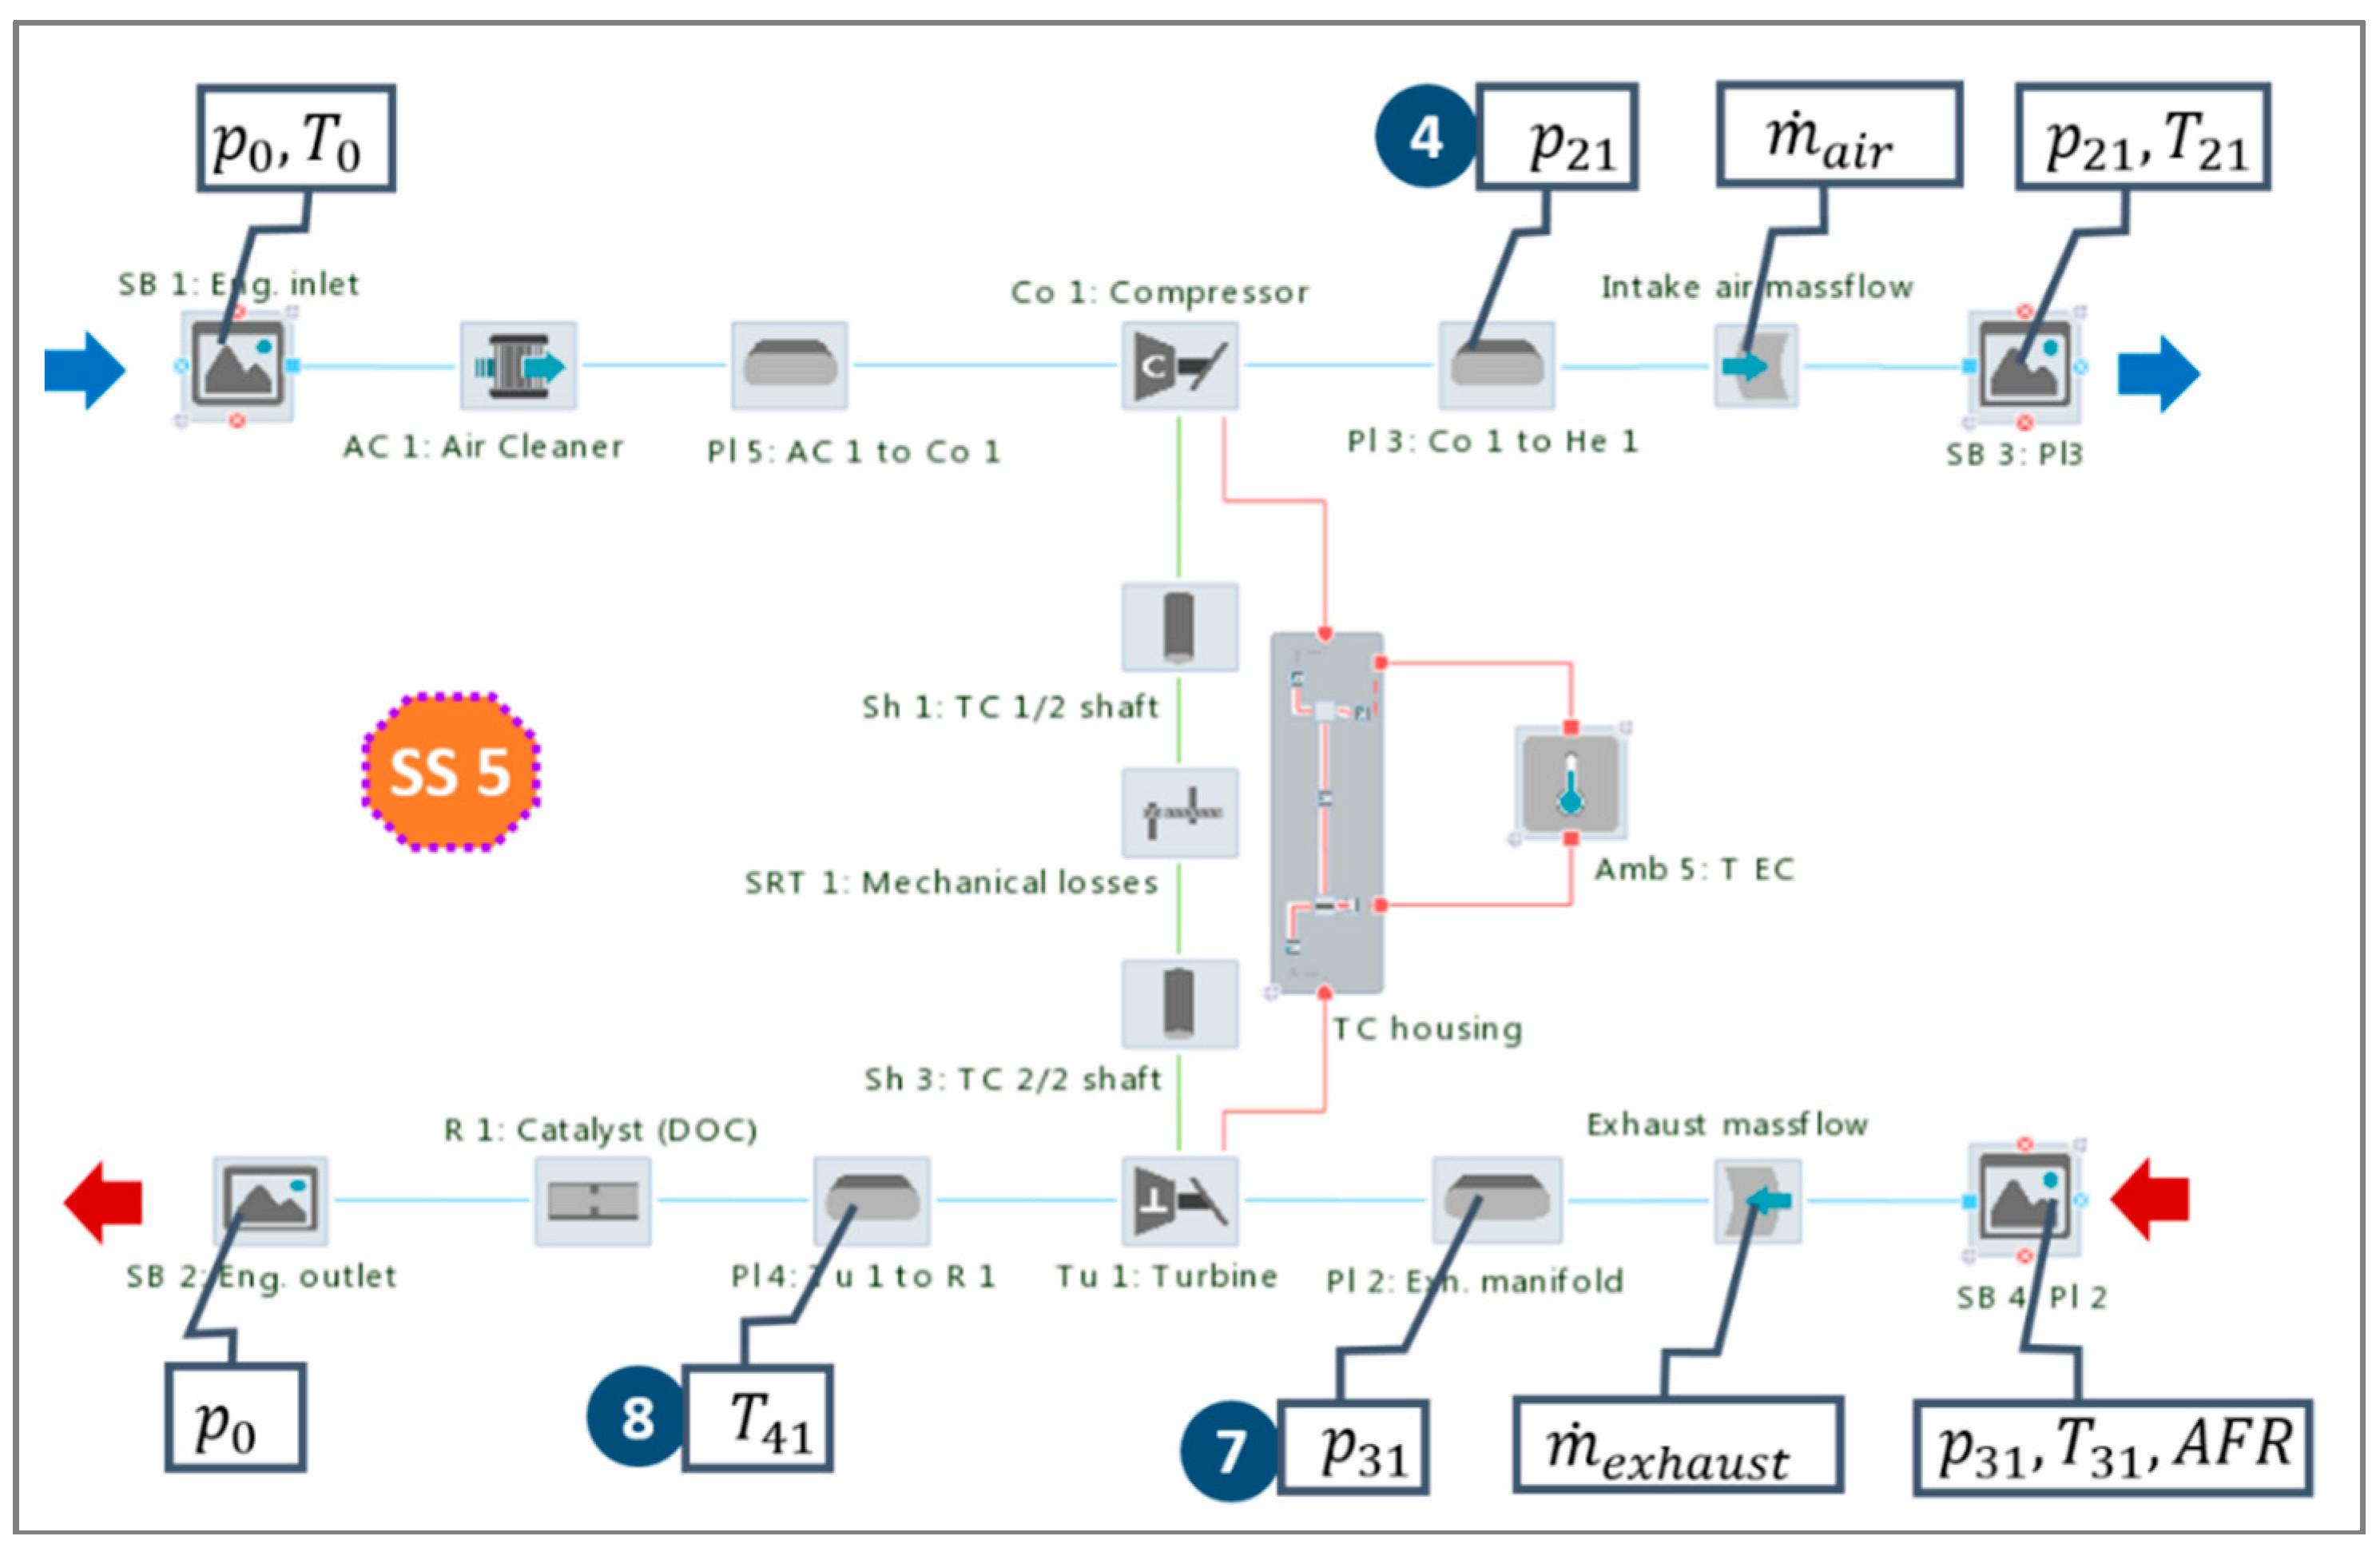 Internal Combustion Engine Diagram Energies Free Full Text Of Internal Combustion Engine Diagram